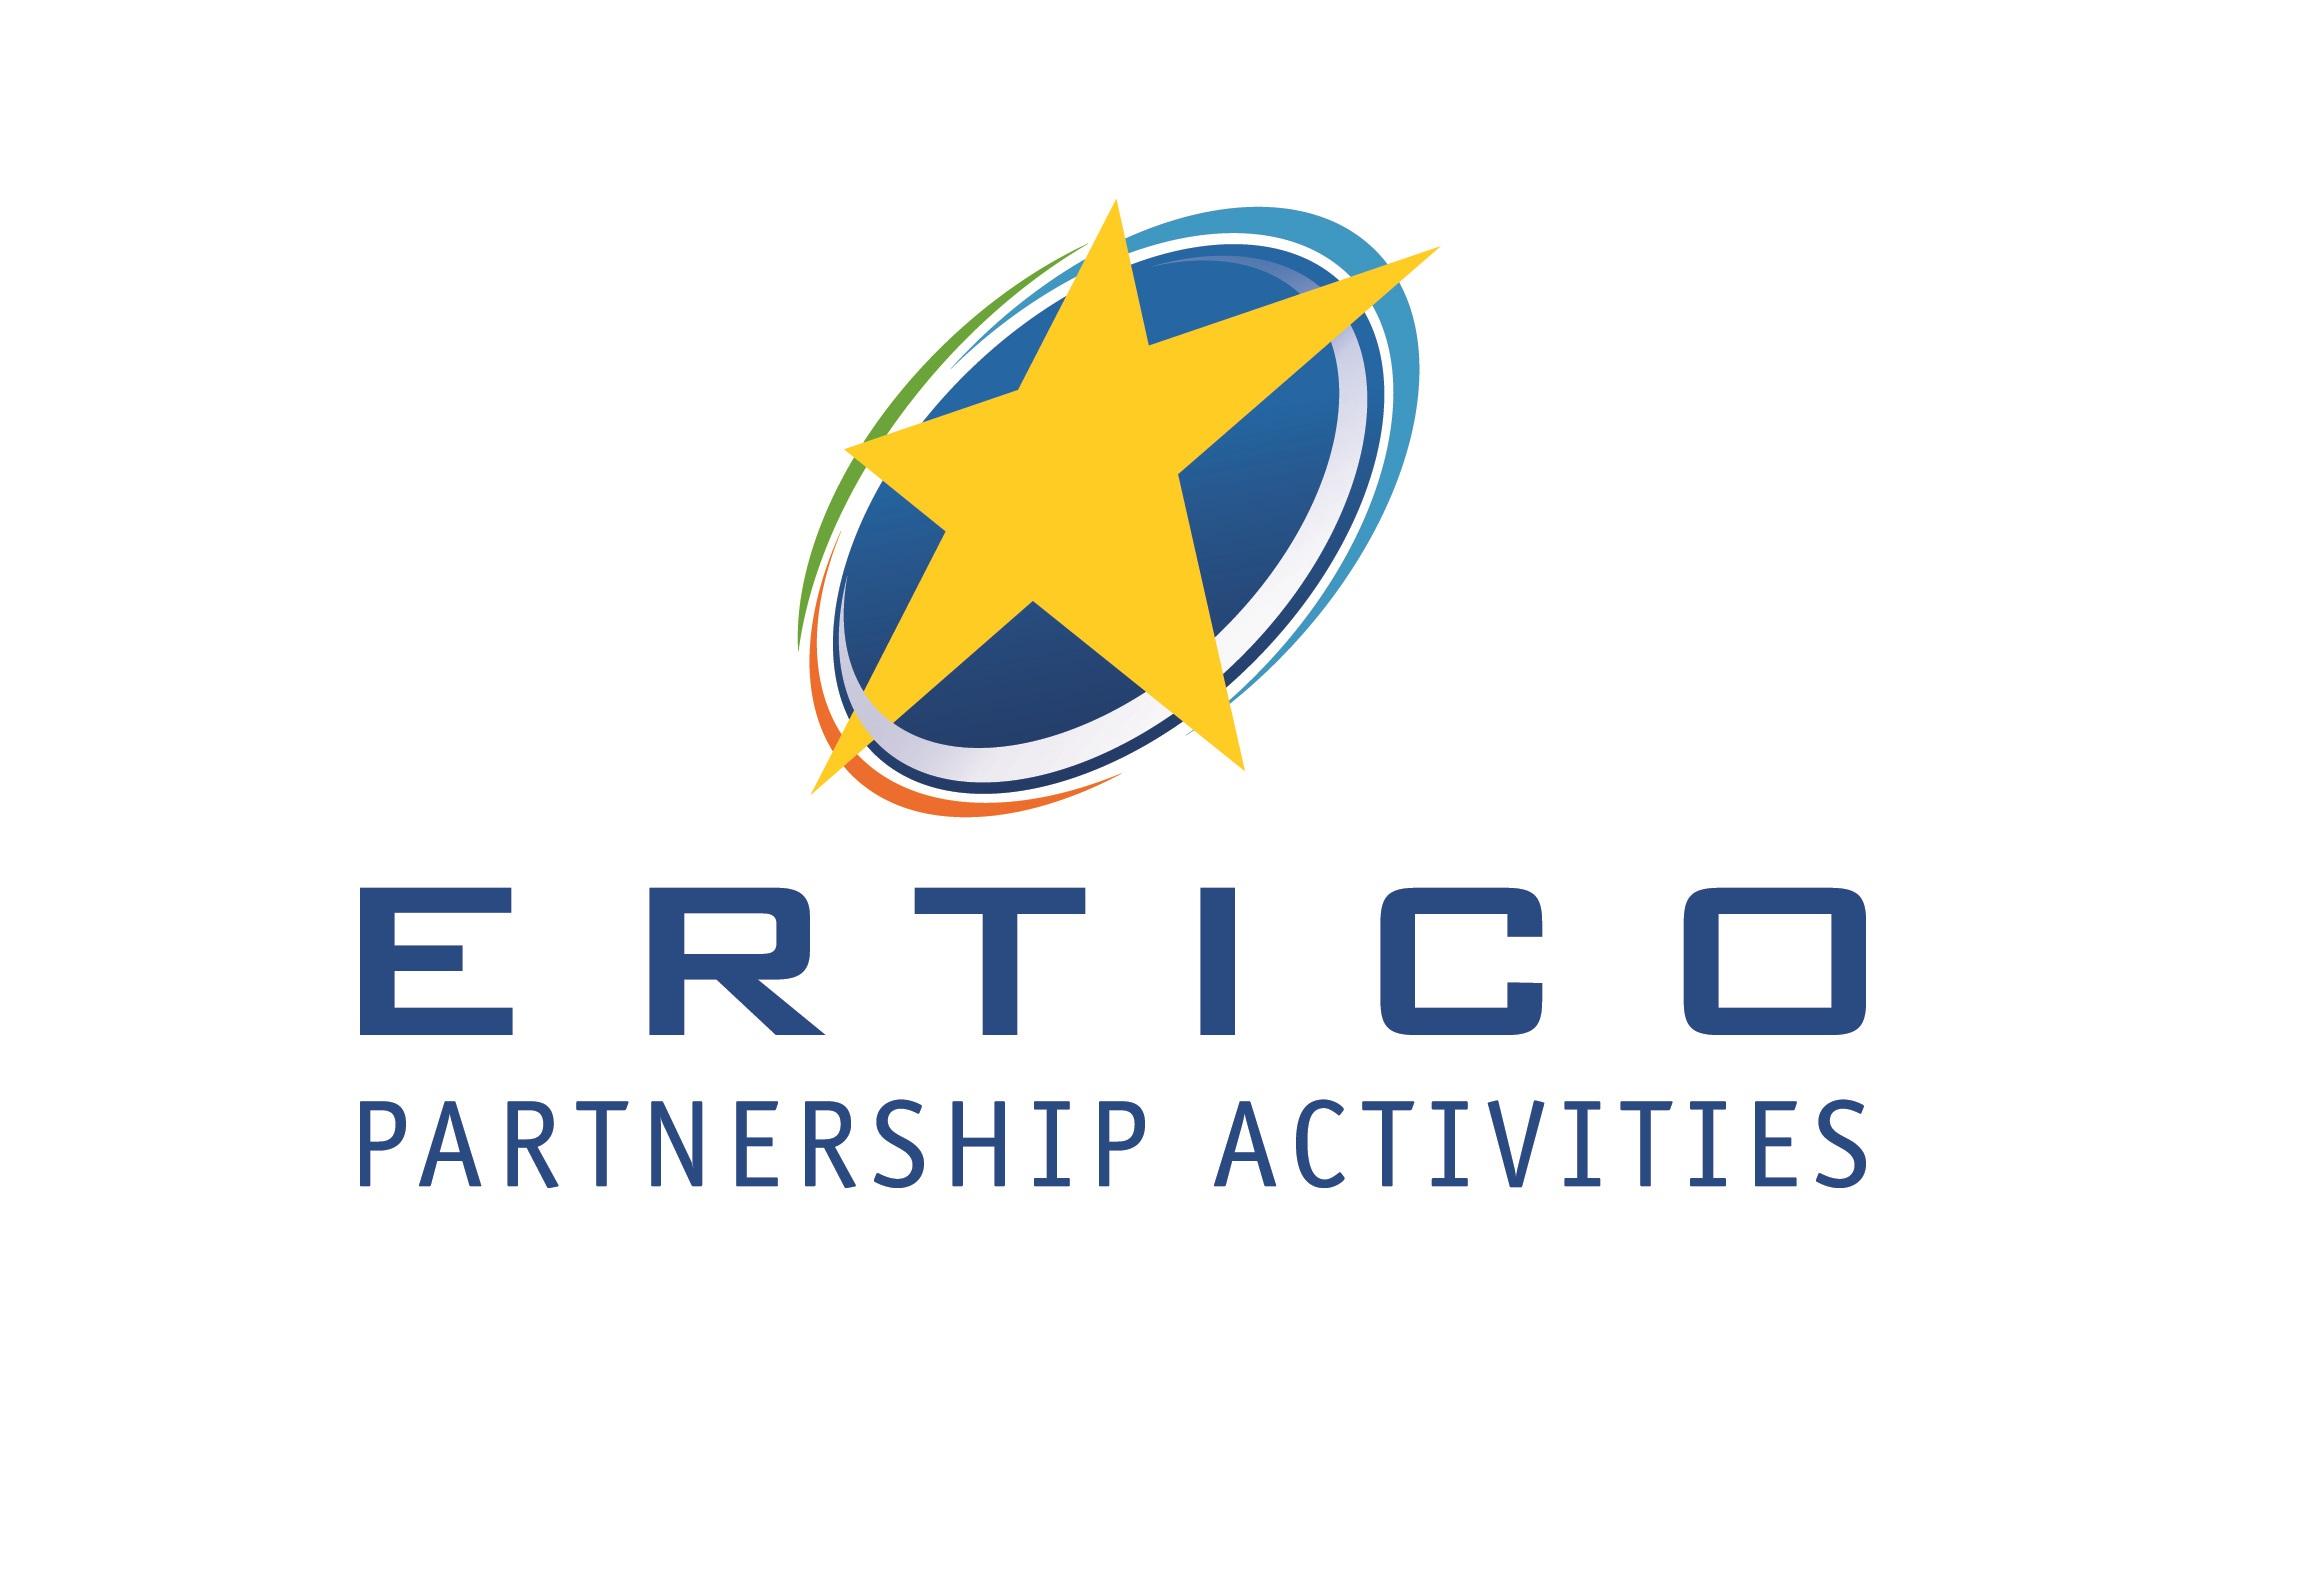 ERTICO_PartnershipActivities_CMYK_HighRes